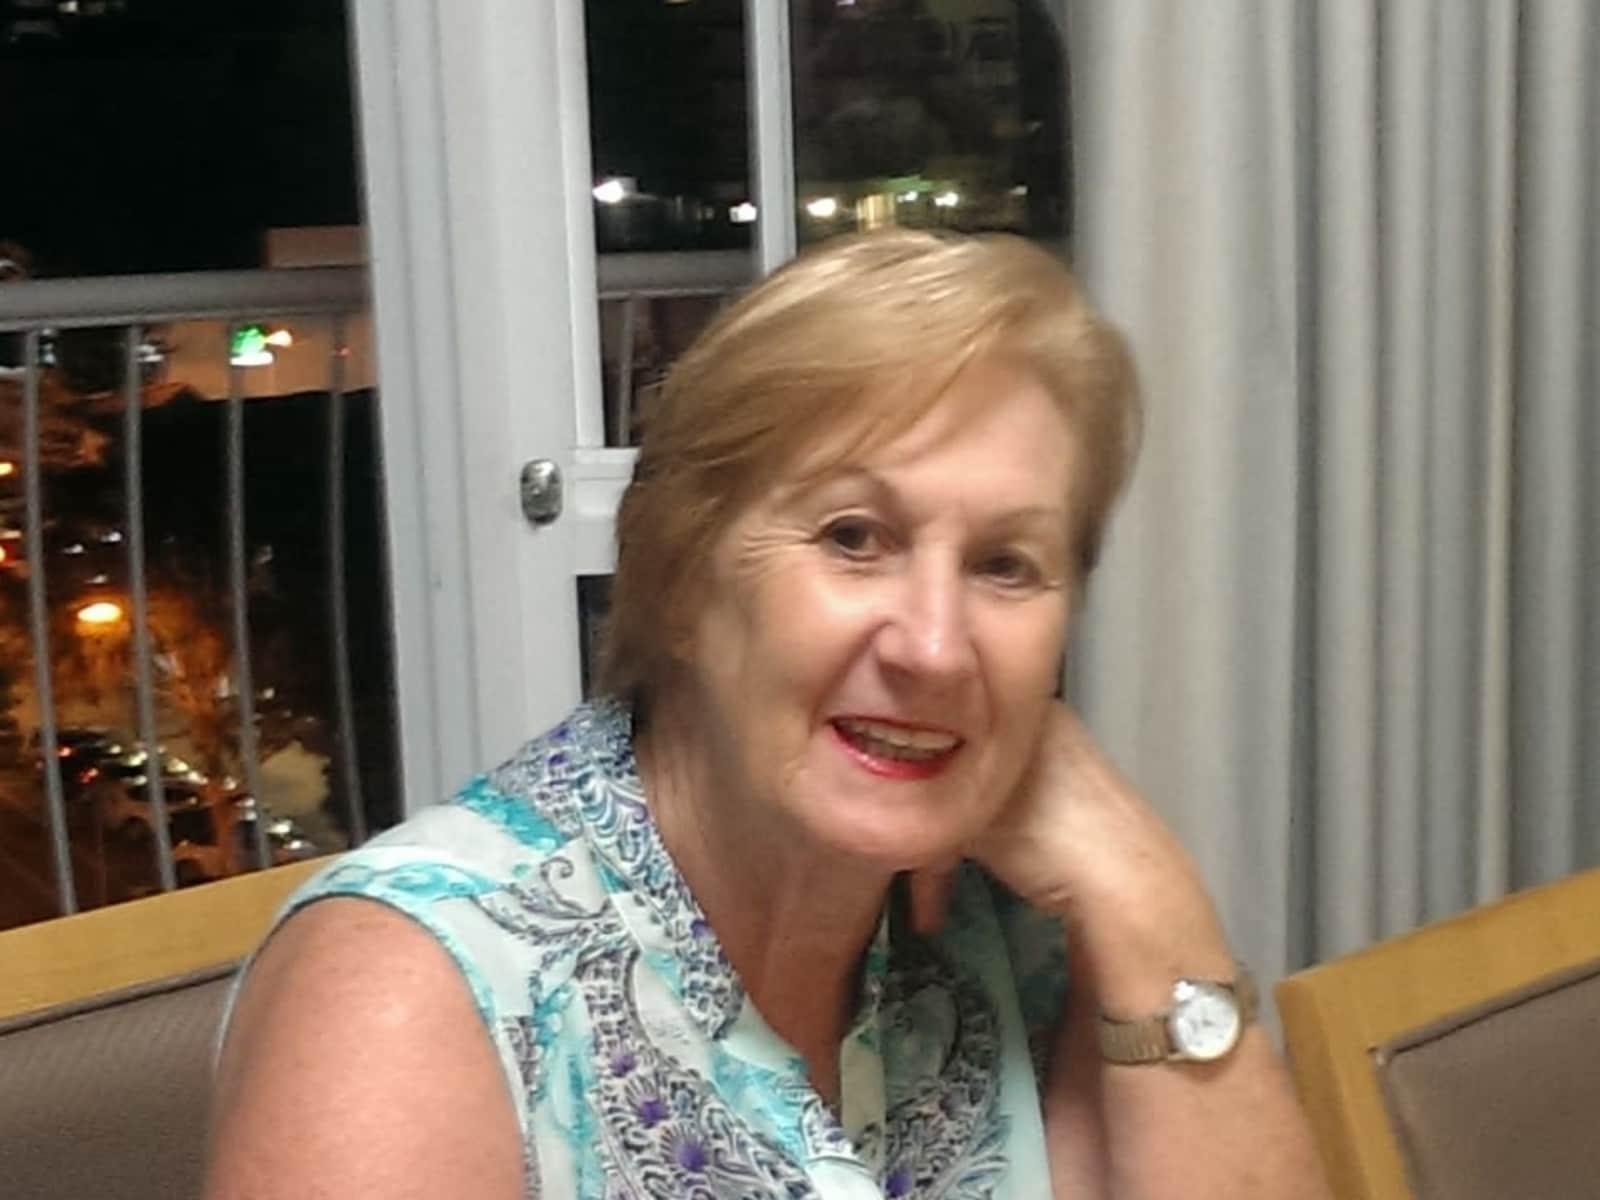 Denise from Mount Martha, Victoria, Australia